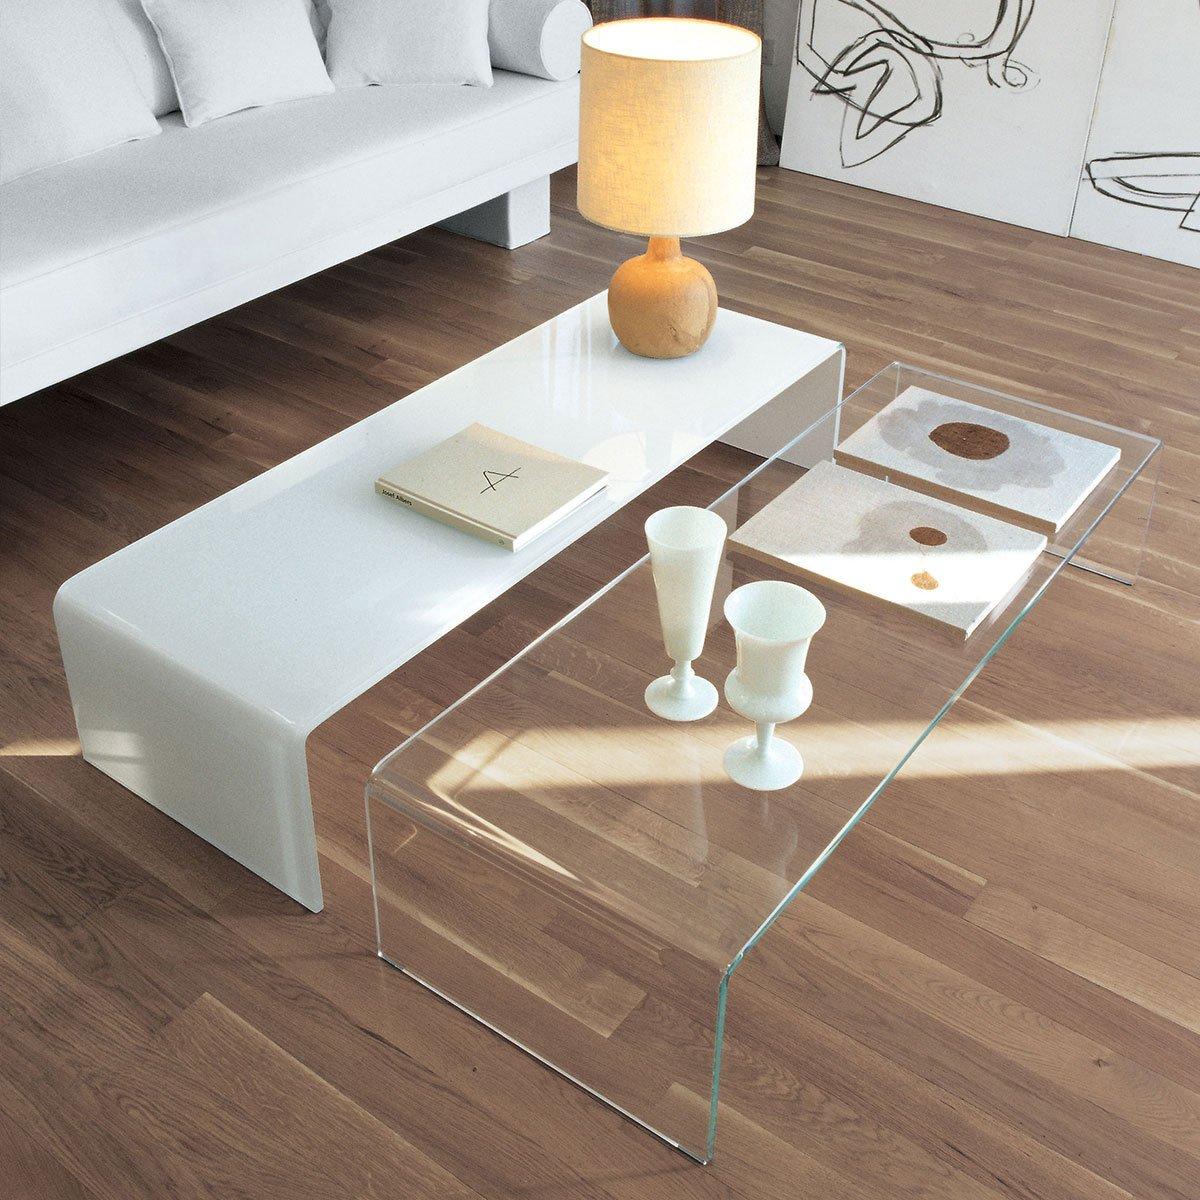 Bespoke Glass Coffee Tables: Sovet Bridge Coffee Table